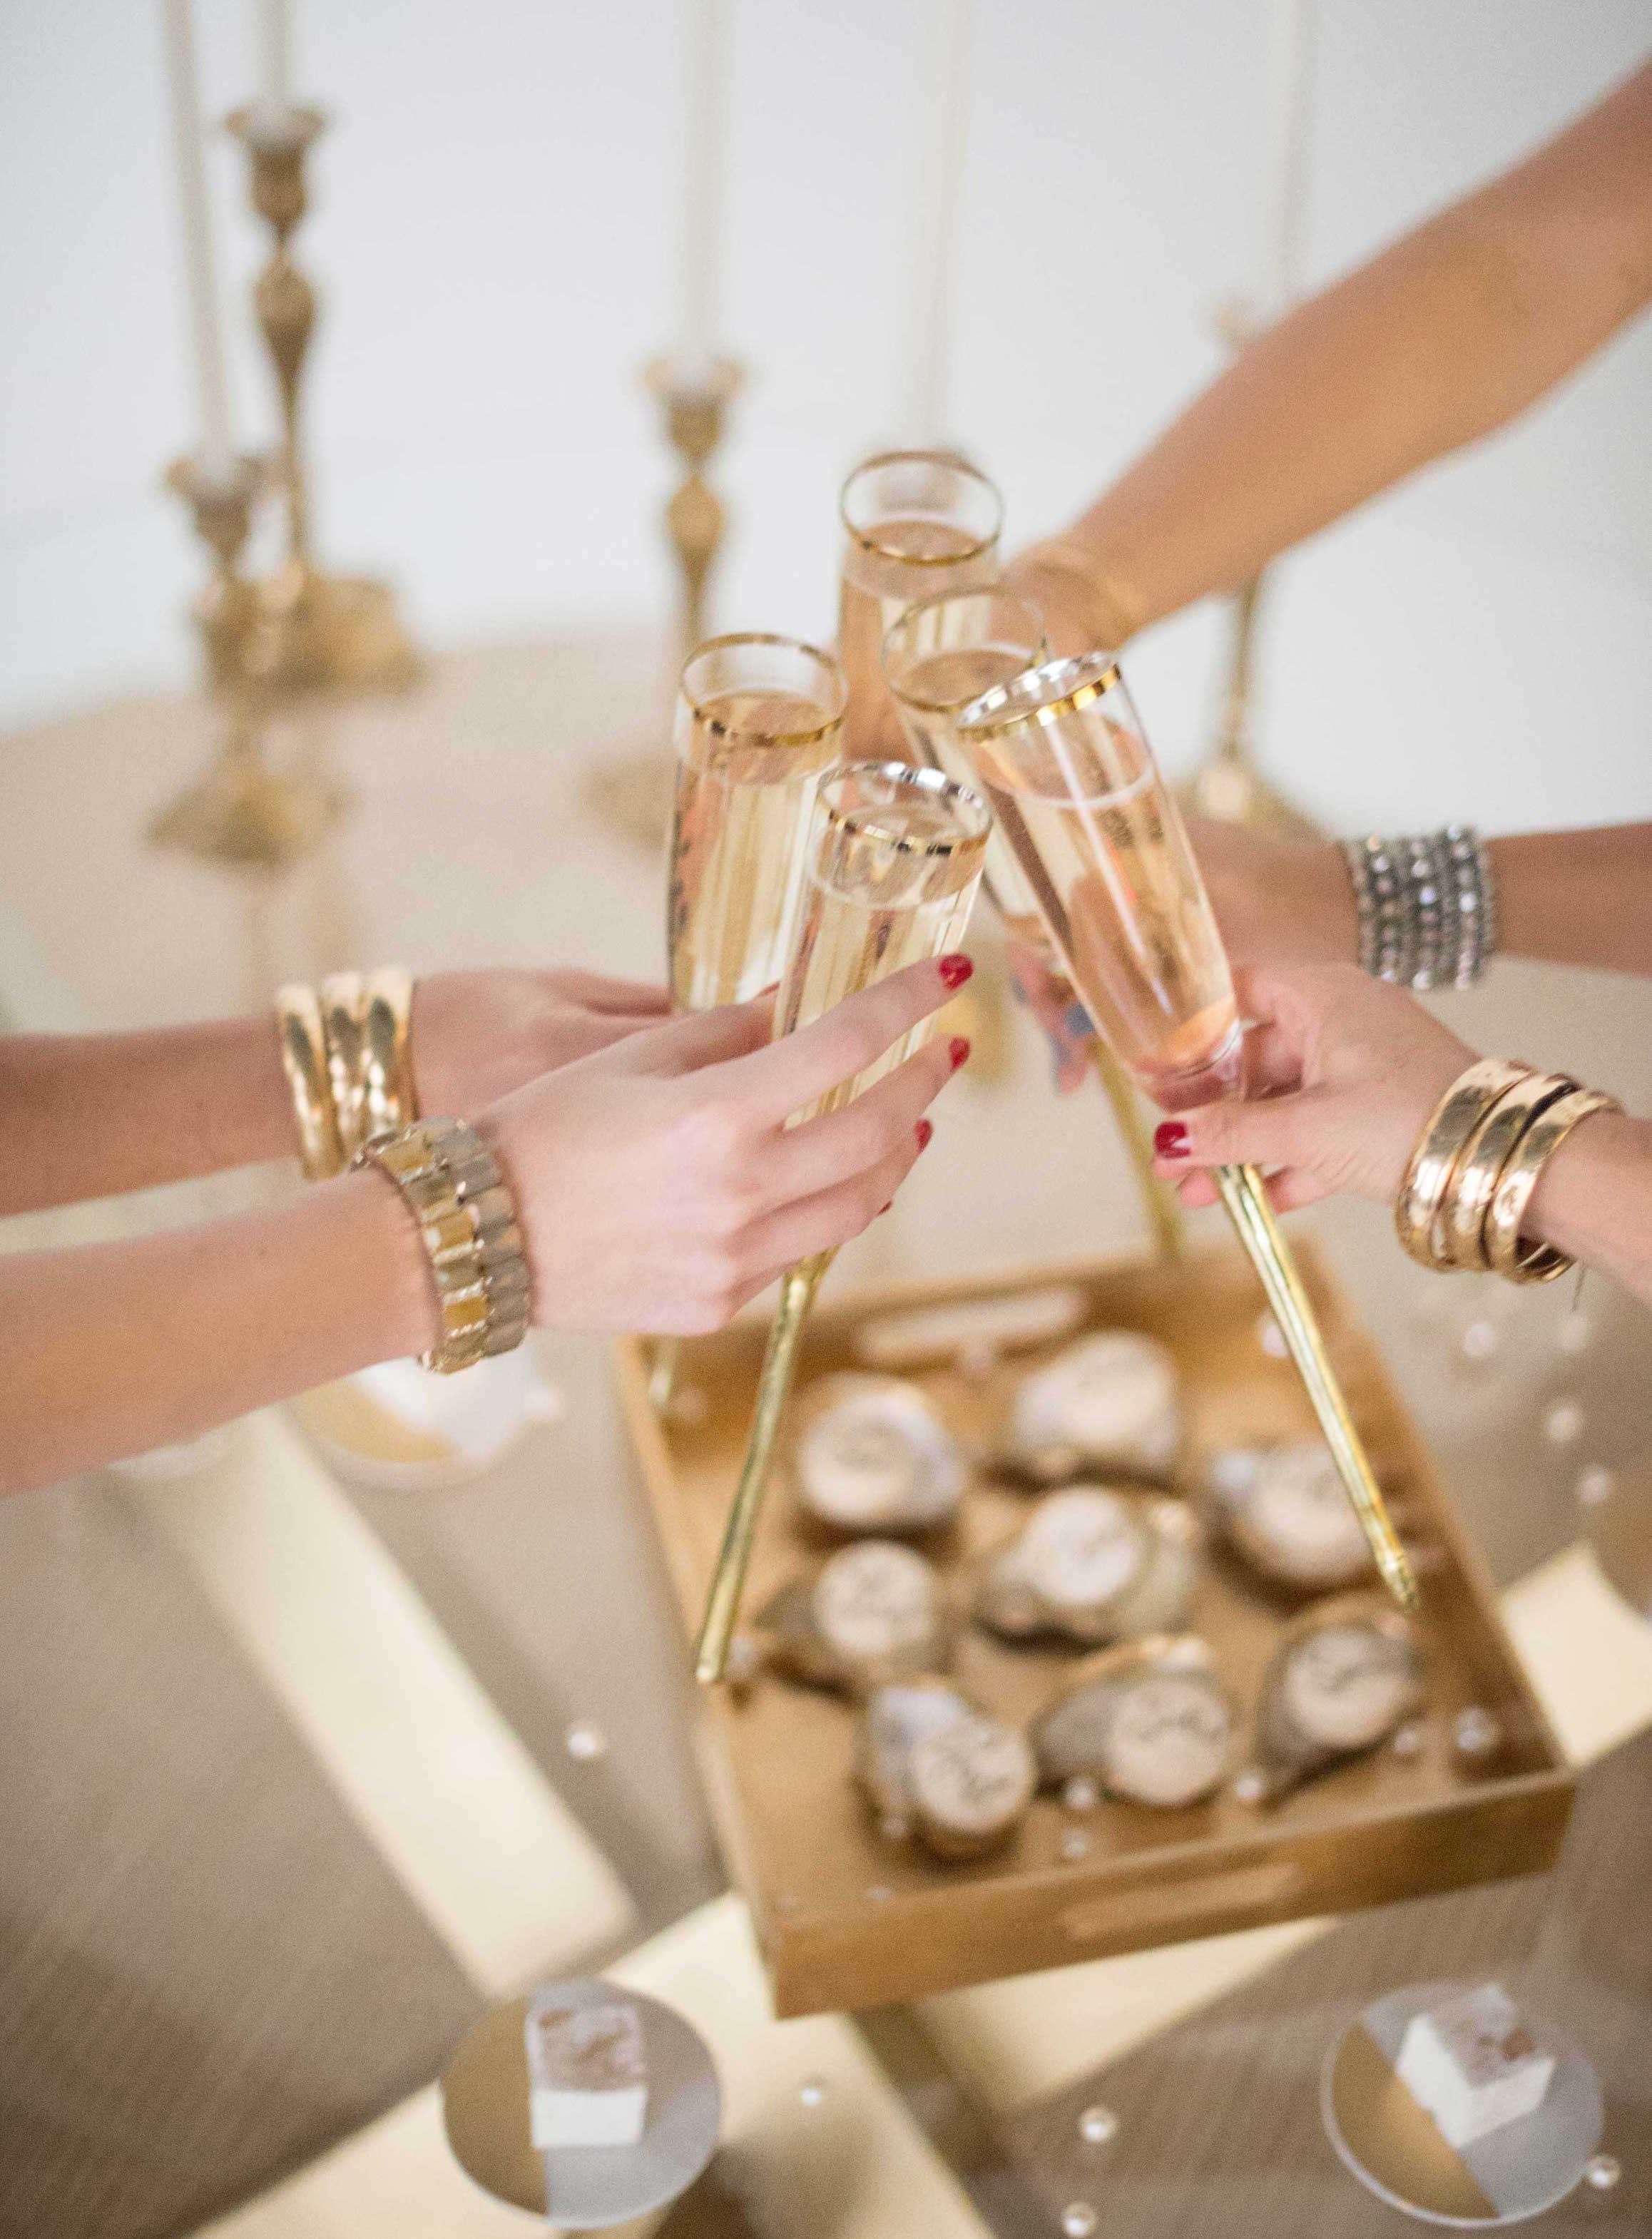 EVOKE DC Seasons of Cocktails winter wedding cocktail idea champagne